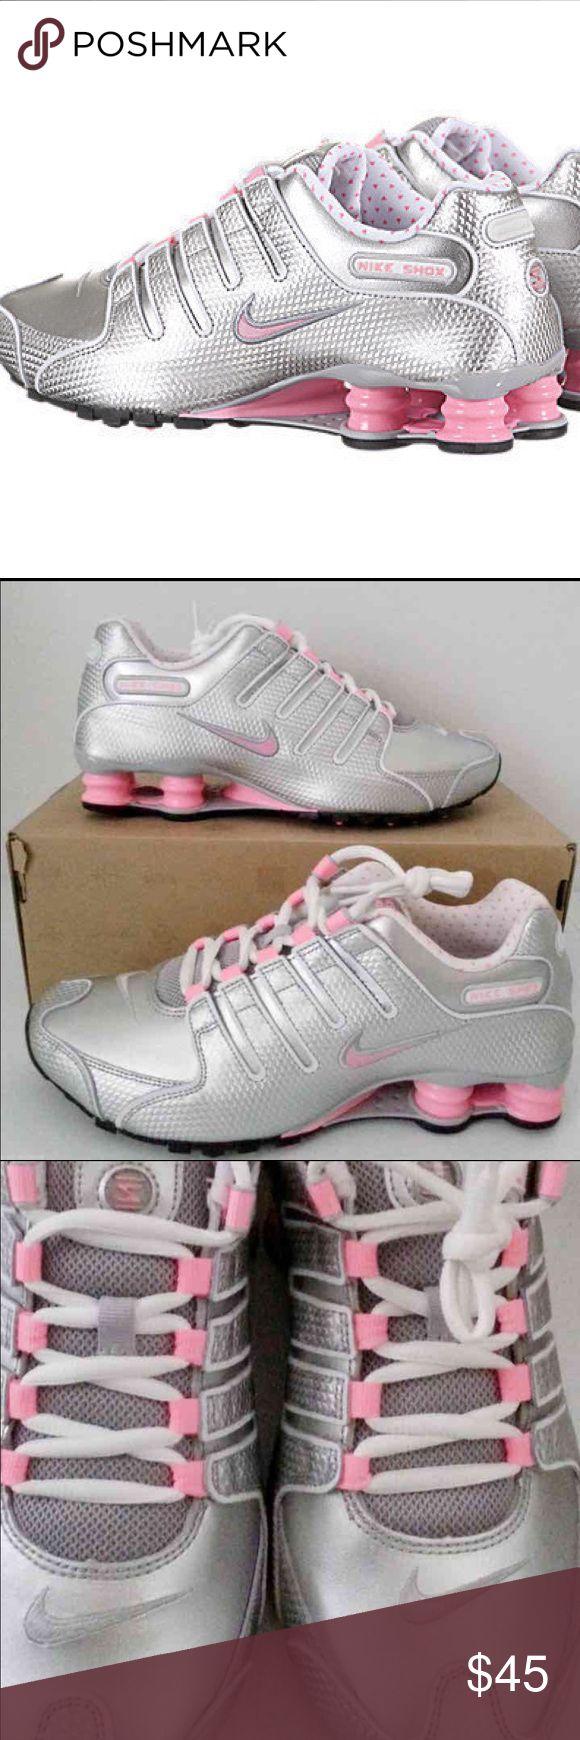 NIKE SHOX NZ EU METALLIC SILVER/PINK Sz8 NIKE SHOX NZ EU PINK/SILVER. Color: Cool Grey / Pink Metallic Silver White. RUNNING SHOES WOMENS Minor scuff on inside back left heel. SIZE 8. No box Retails for $185 Nike Shox Shoes Athletic Shoes